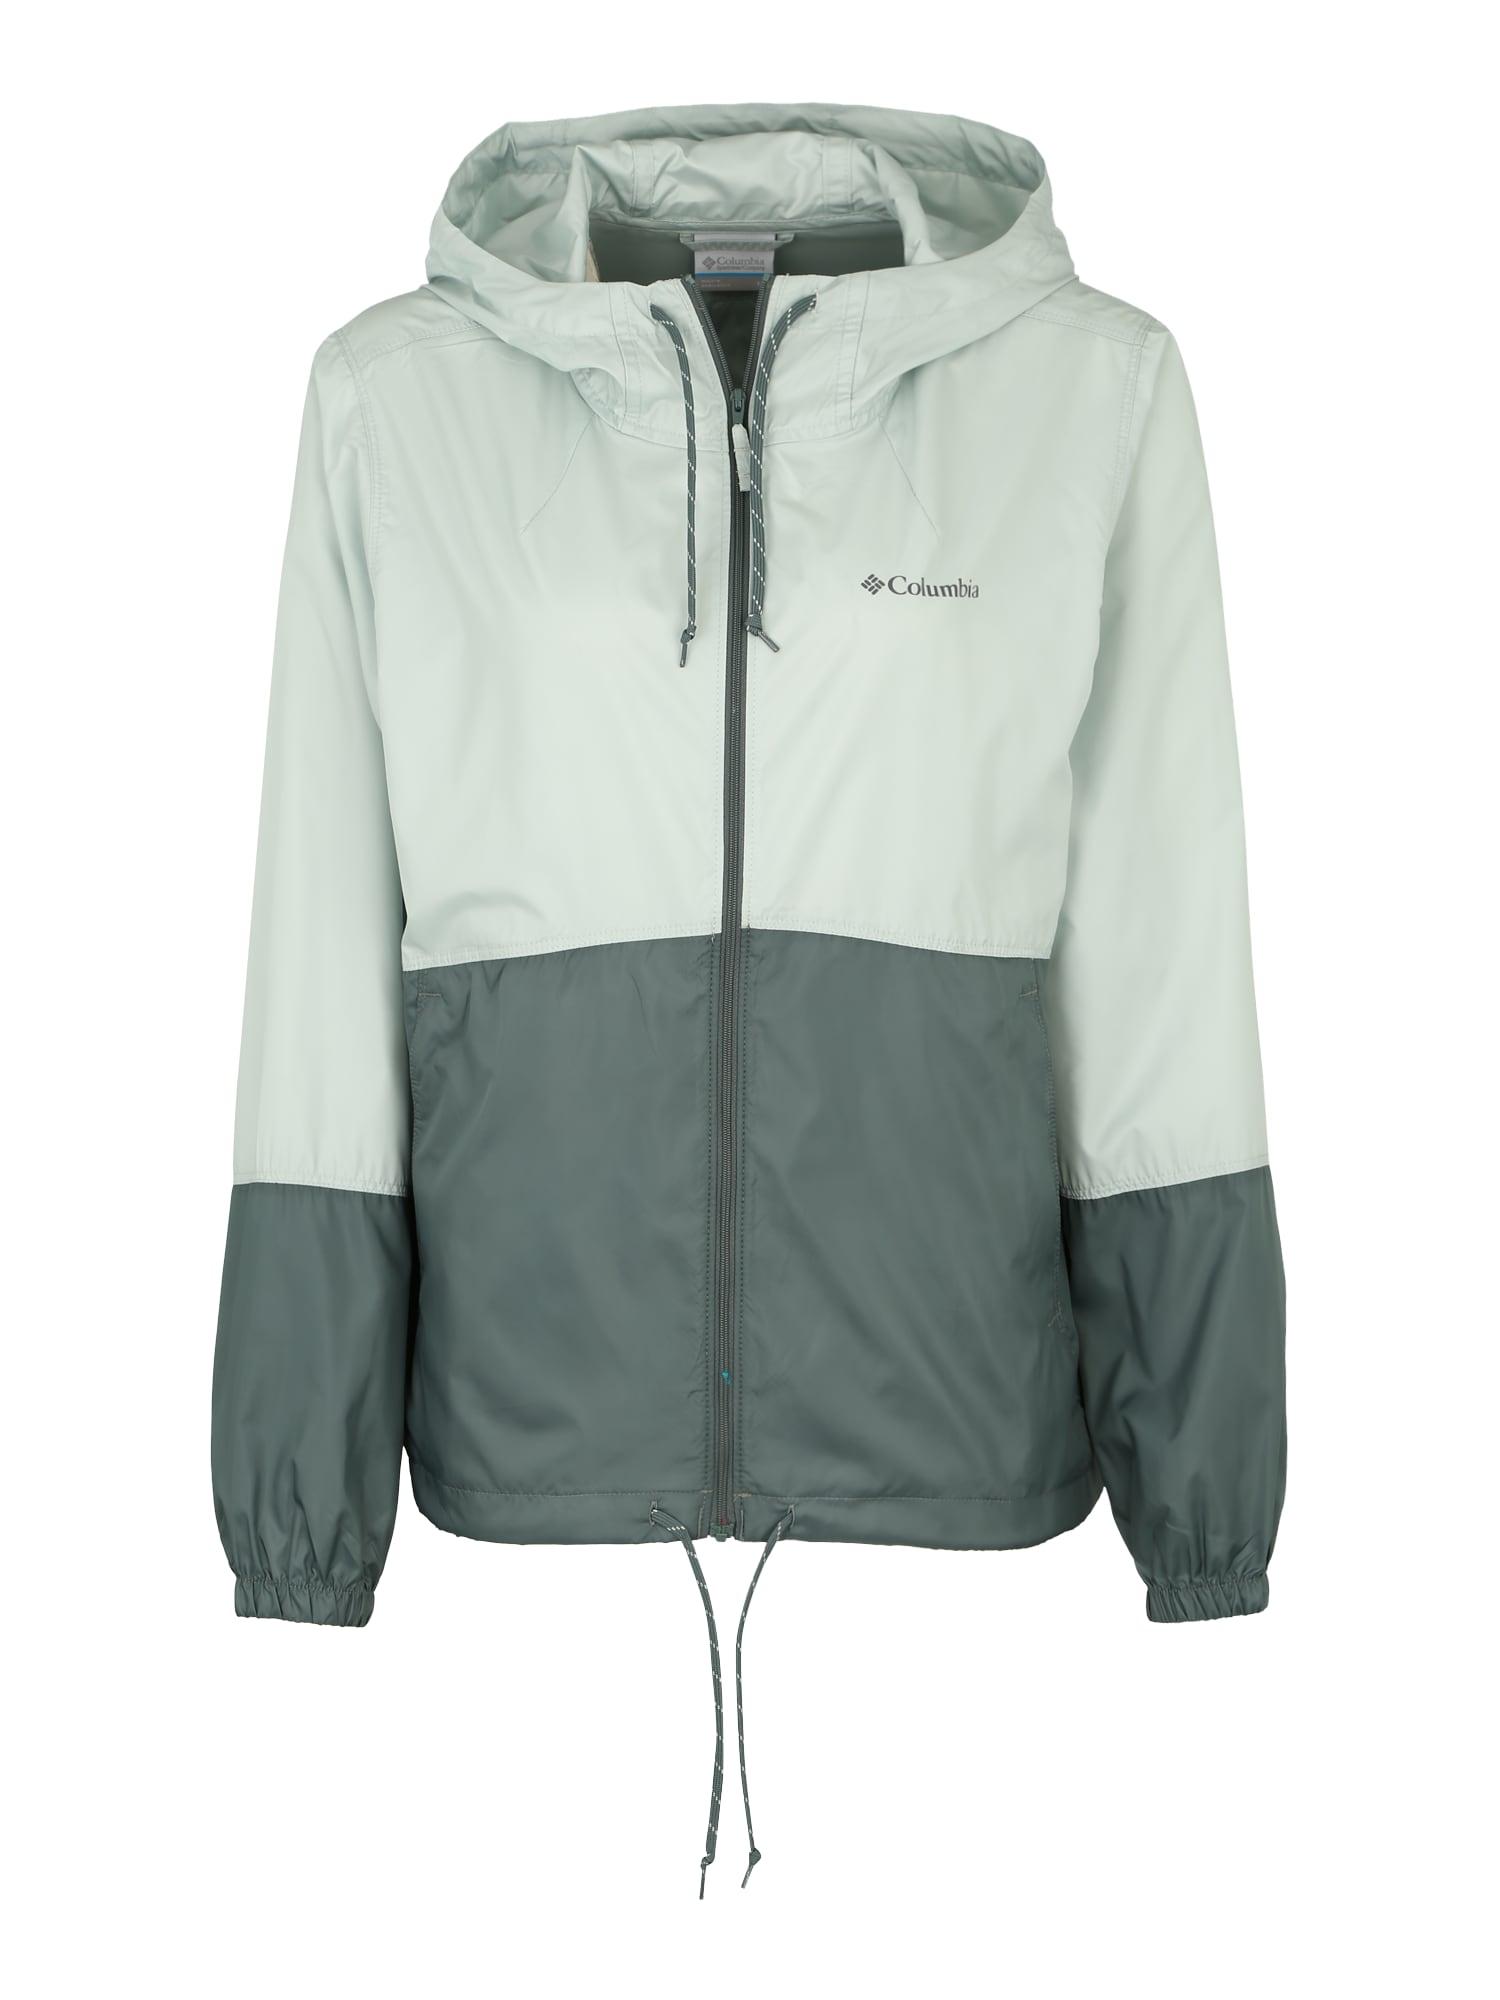 Outdoorová bunda Flash Forward mátová jedle COLUMBIA